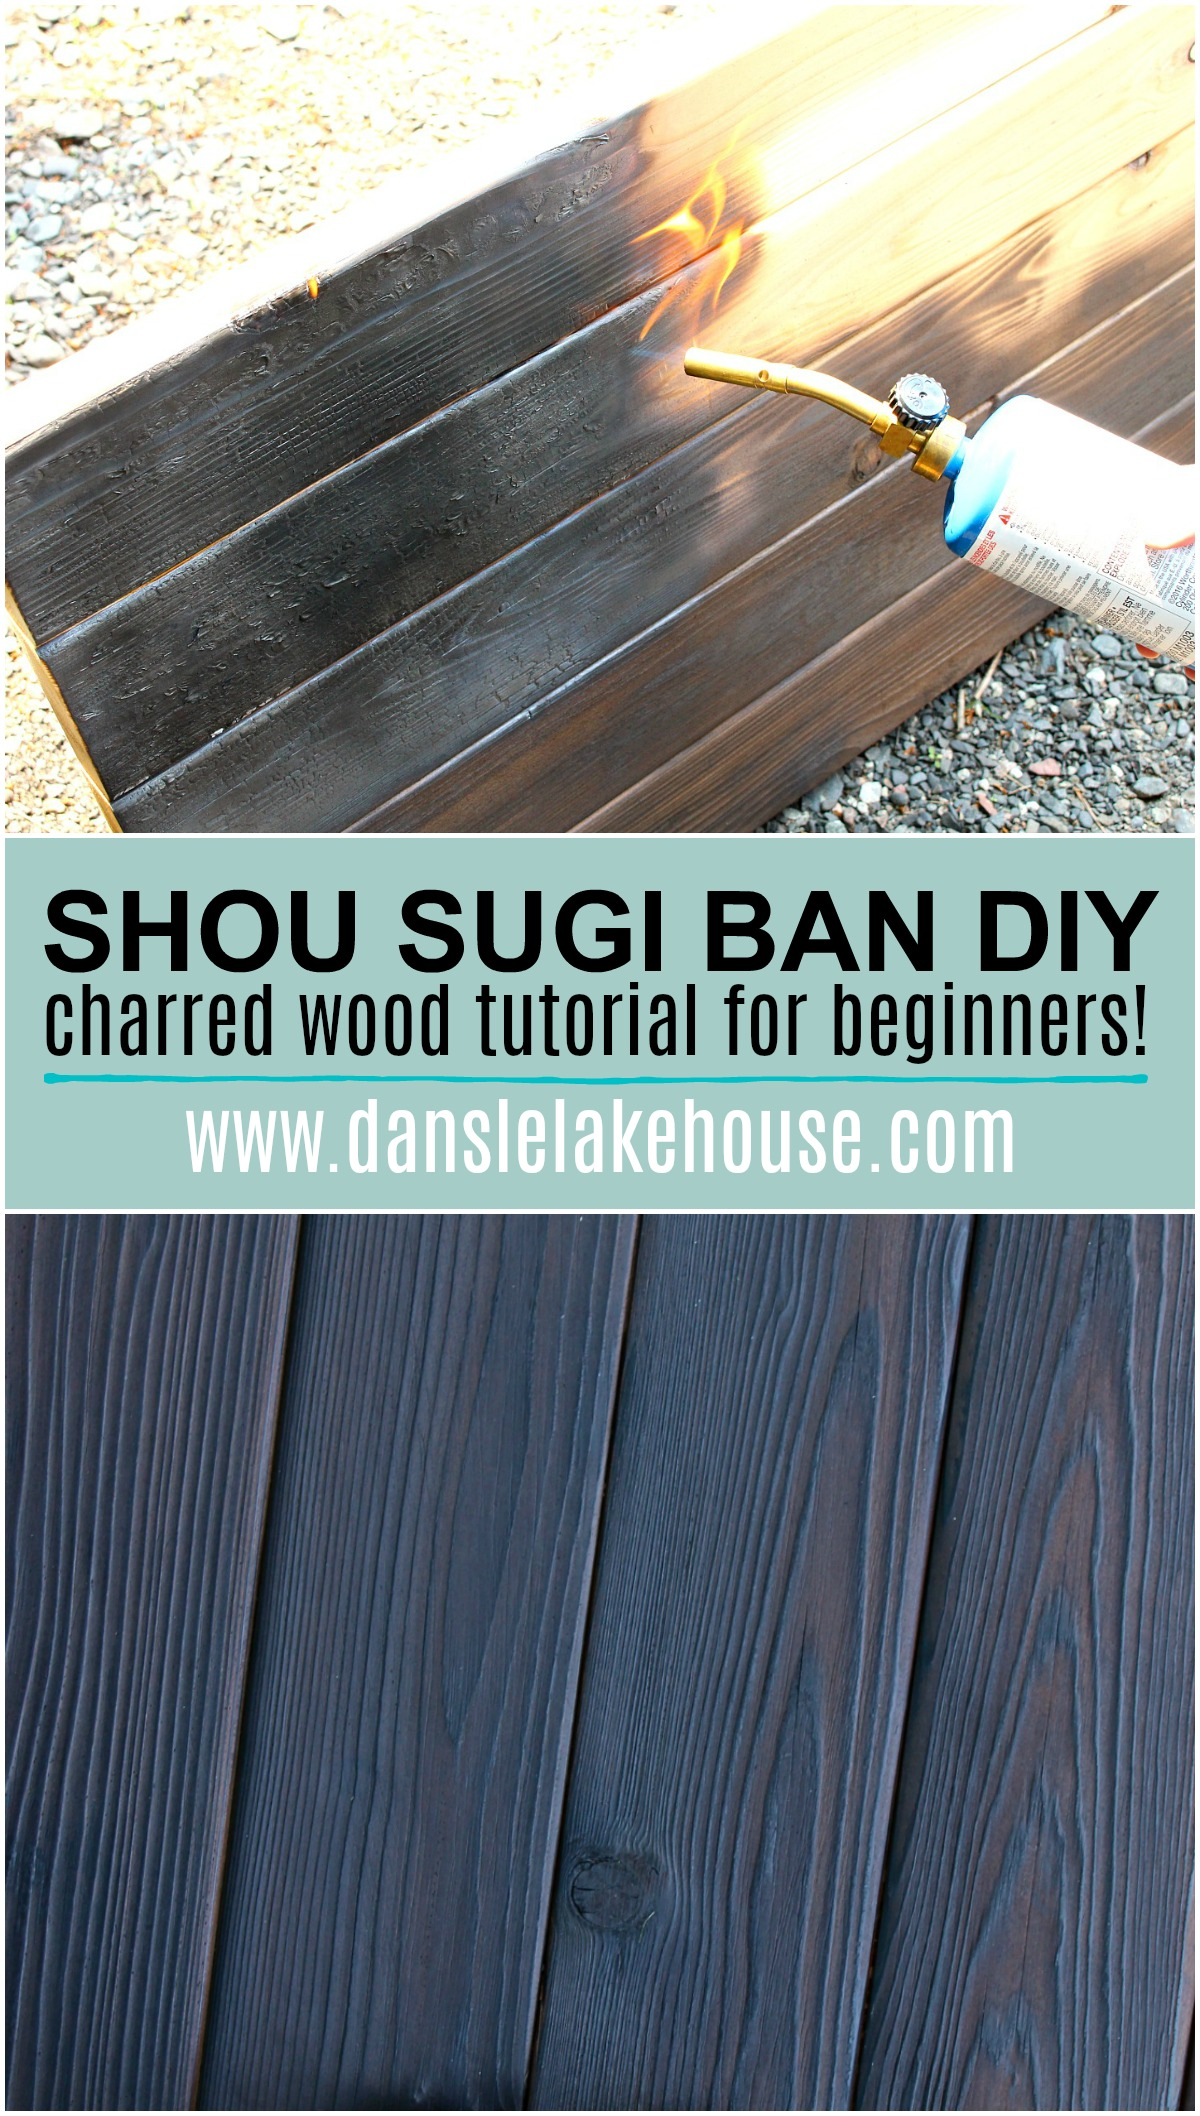 Shou Sugi Ban DIY: Charred Wood Tutorial for Beginners